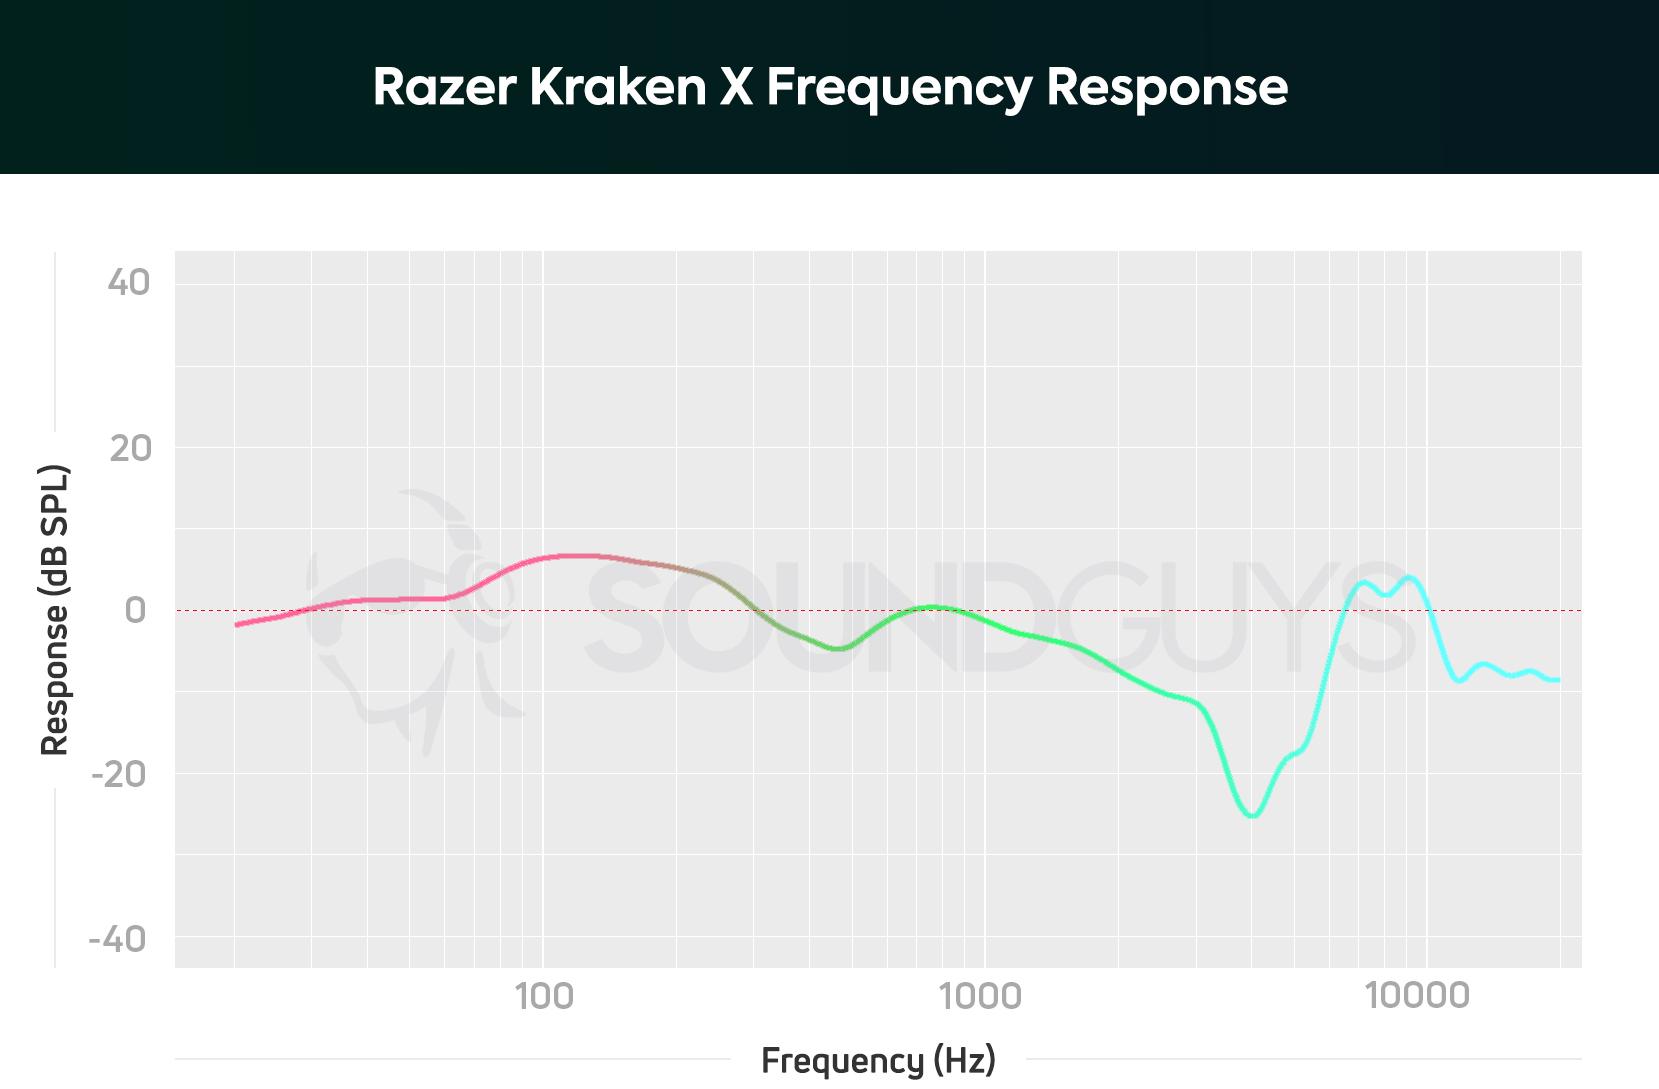 Razer Kraken X frequency response chart depicting amplified upper bass notes.